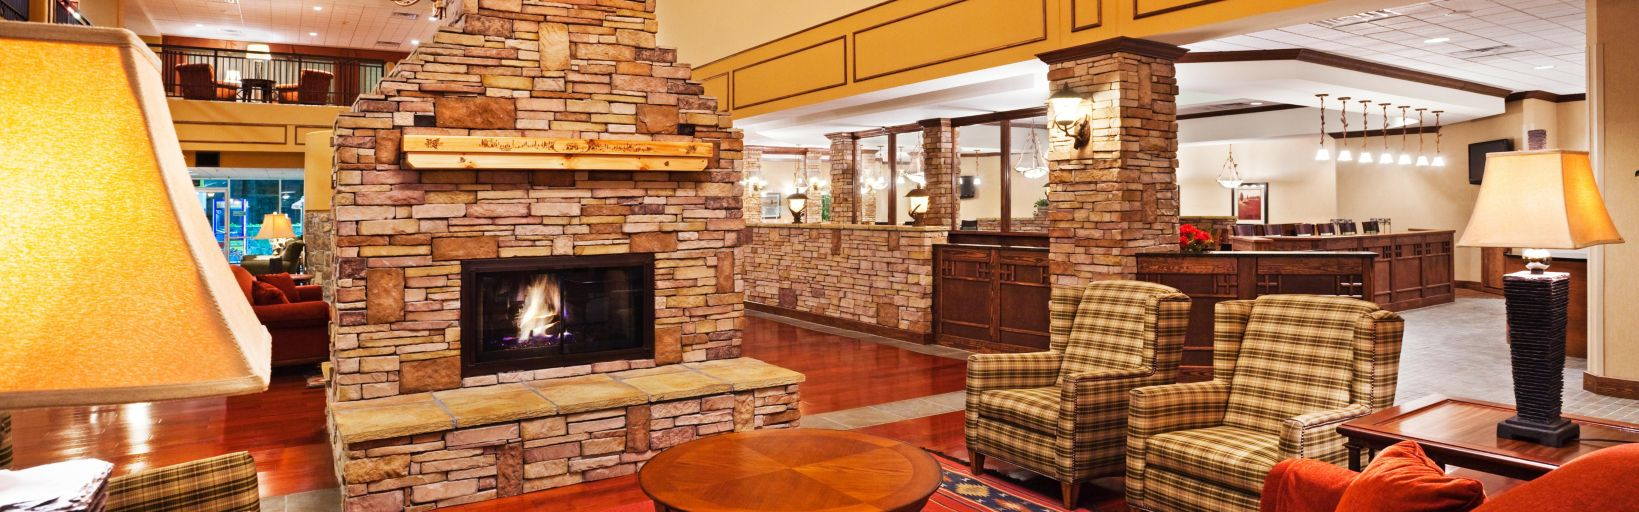 pigeon forge tn hotels holiday inn hotel u0026 suites